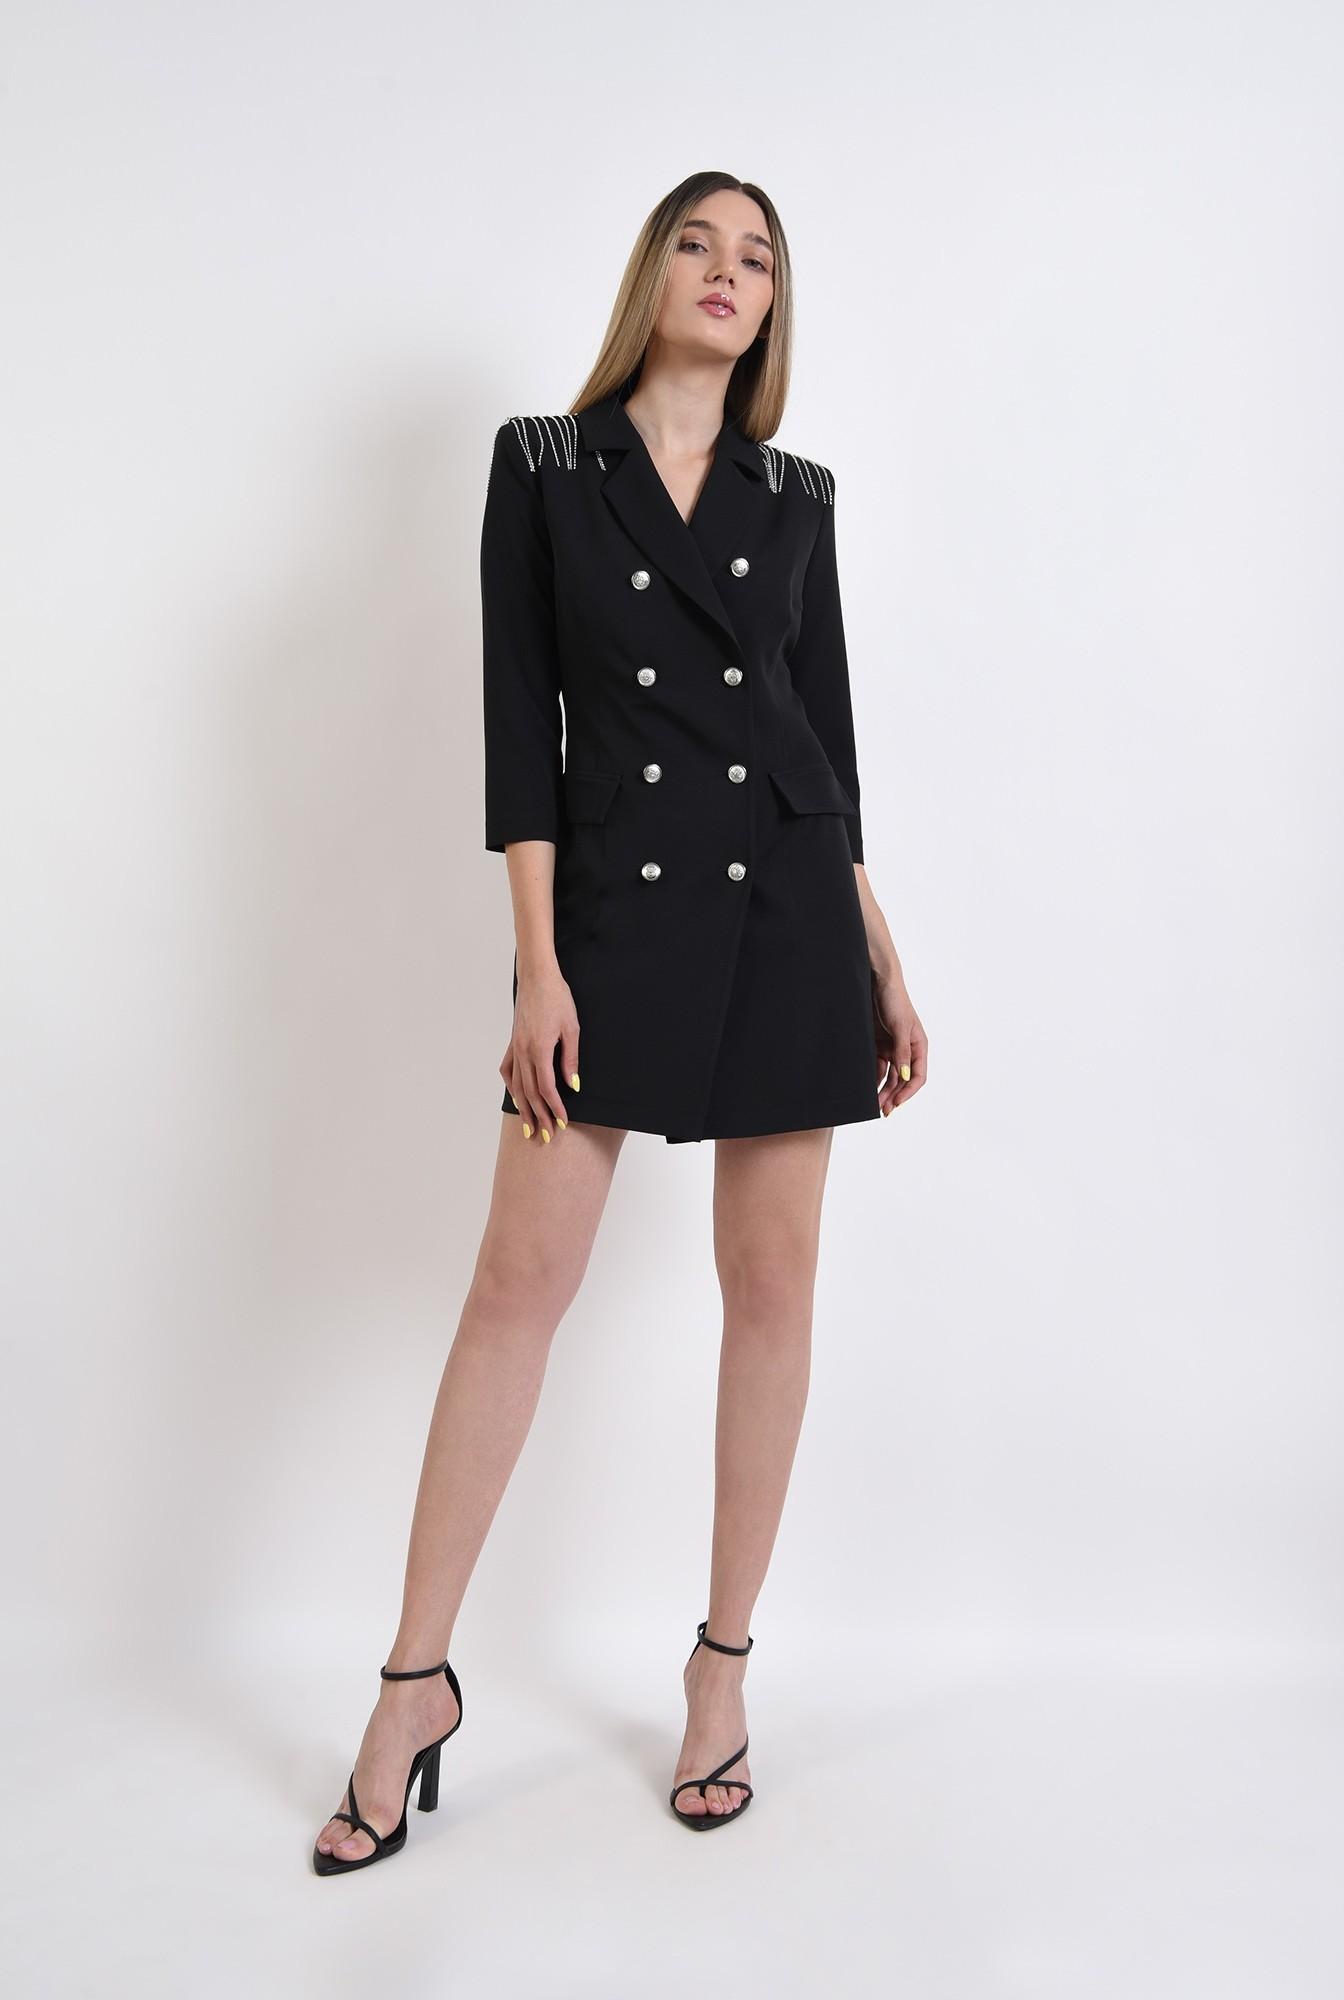 2 - rochie neagra, stil sacou, cu nasturi metalici